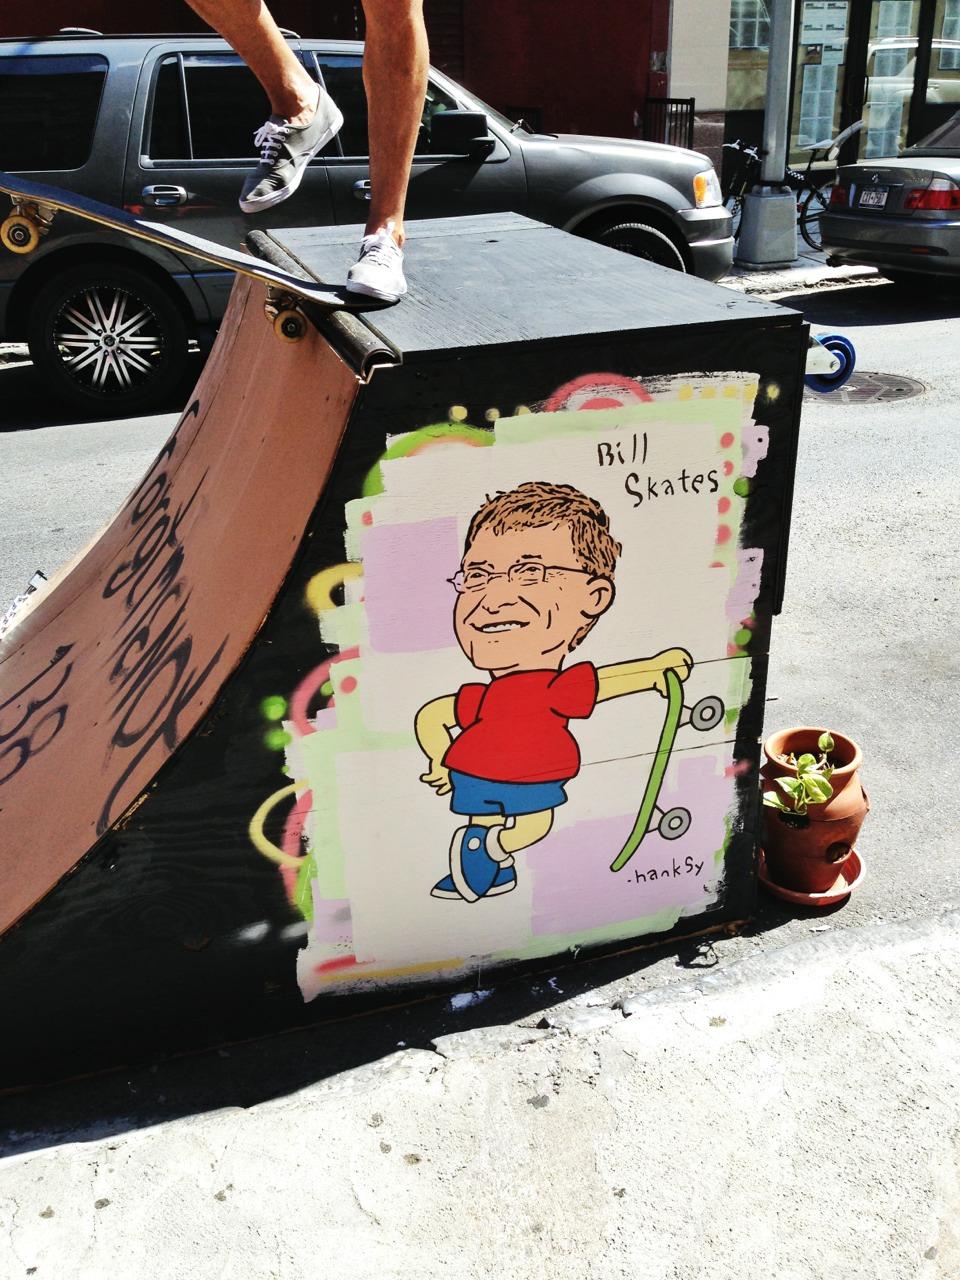 Bill Skates, Chinatown, NYC